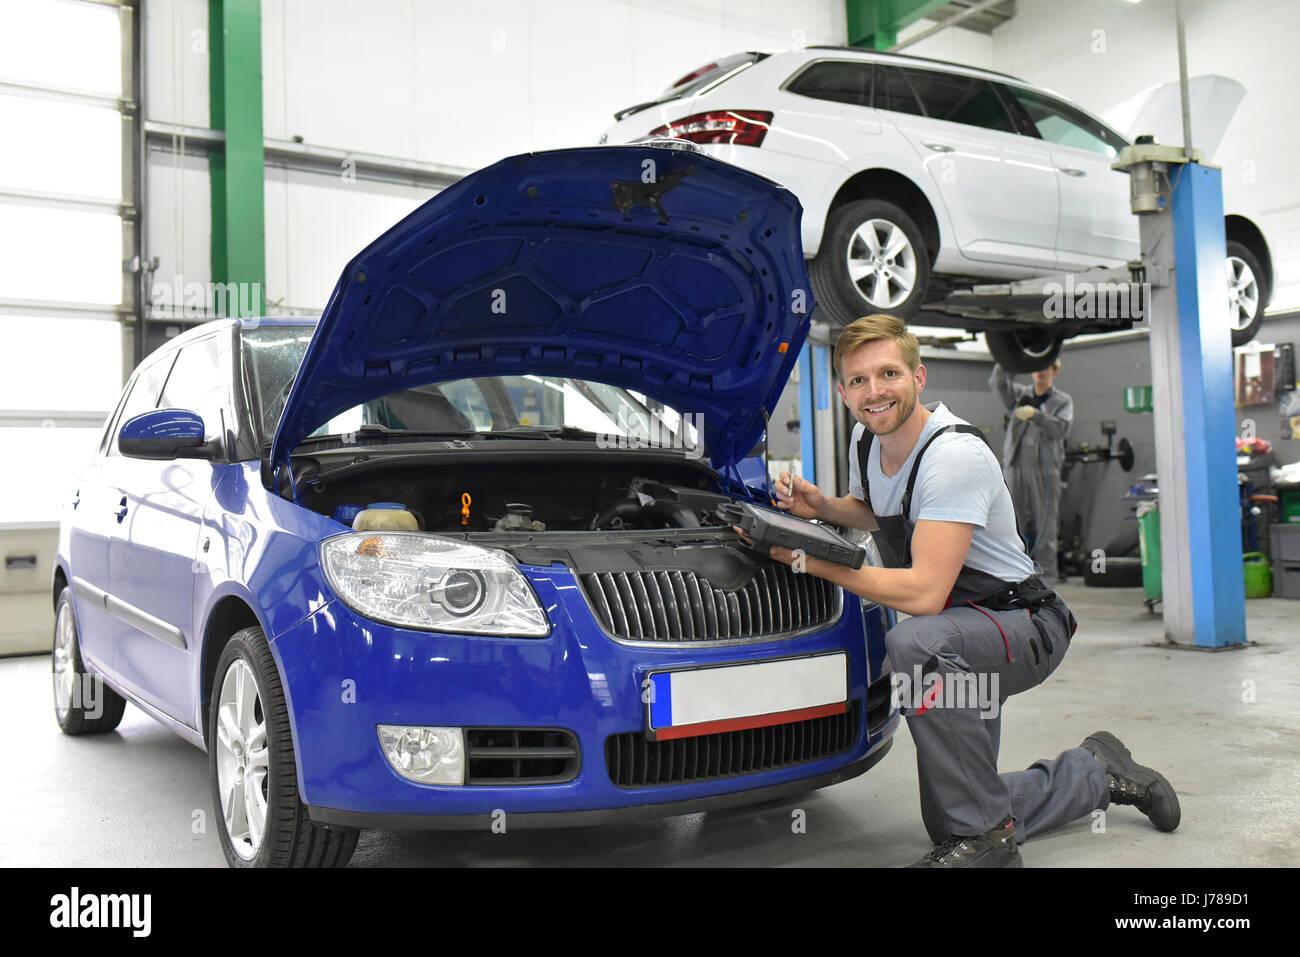 Car mechanic in a workshop using diagnostics computer at car - Stock Image